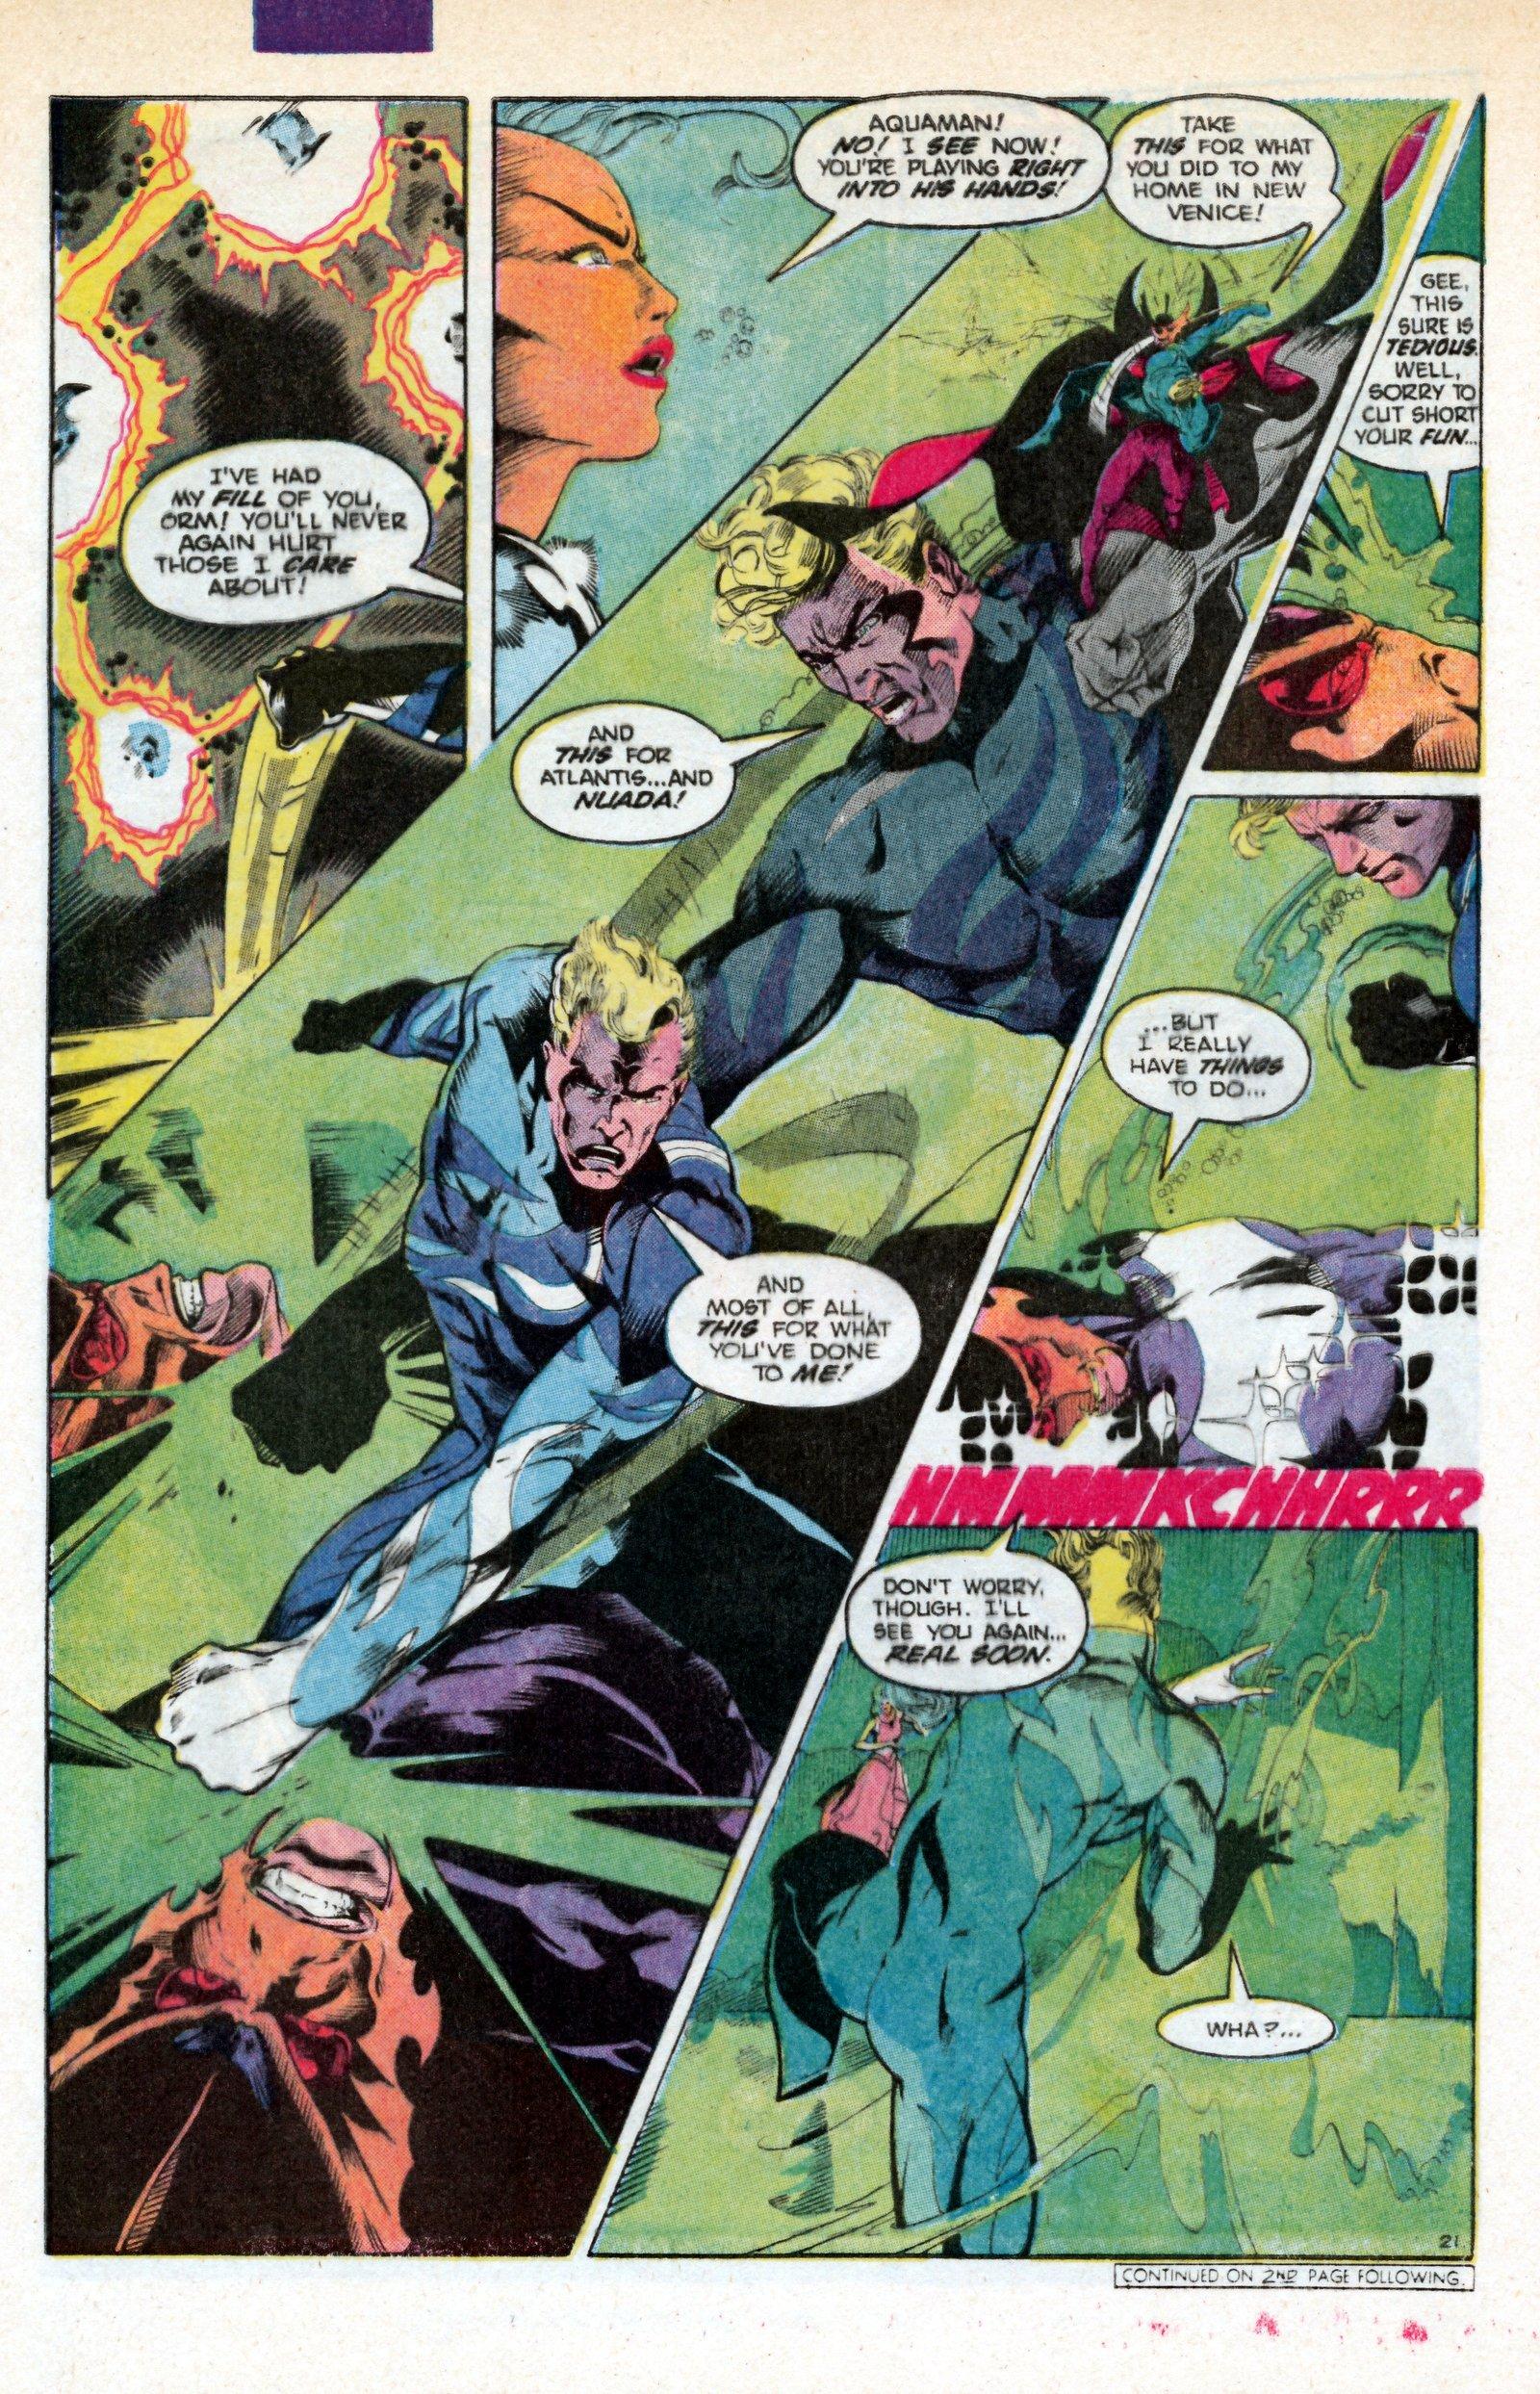 Read online Aquaman (1986) comic -  Issue #3 - 31